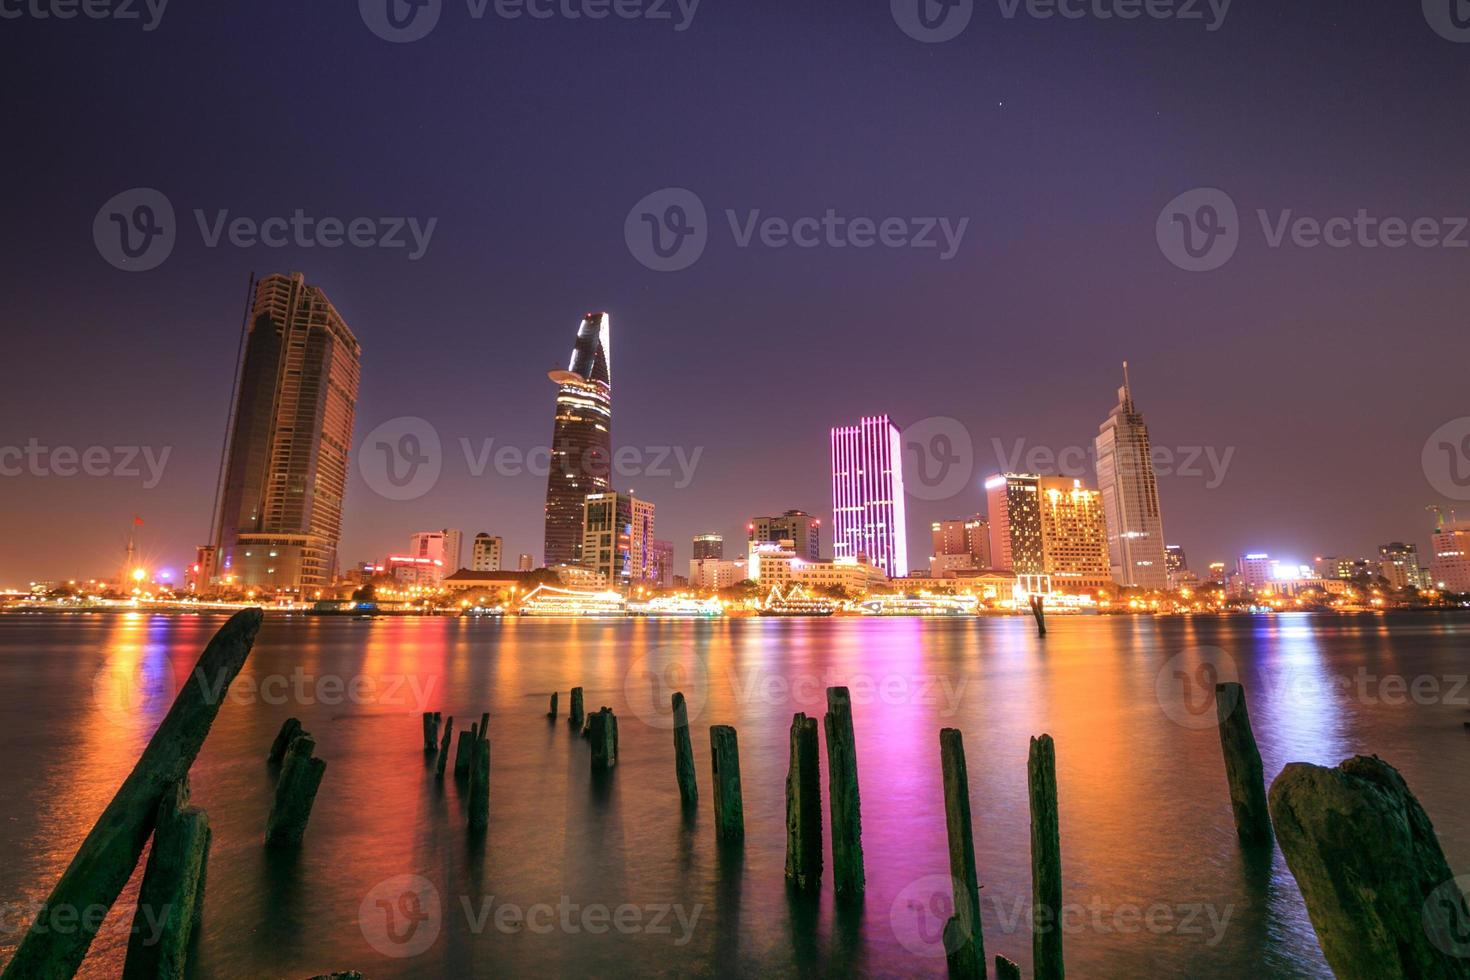 Ho Chi Minh City Saigon River at night photo